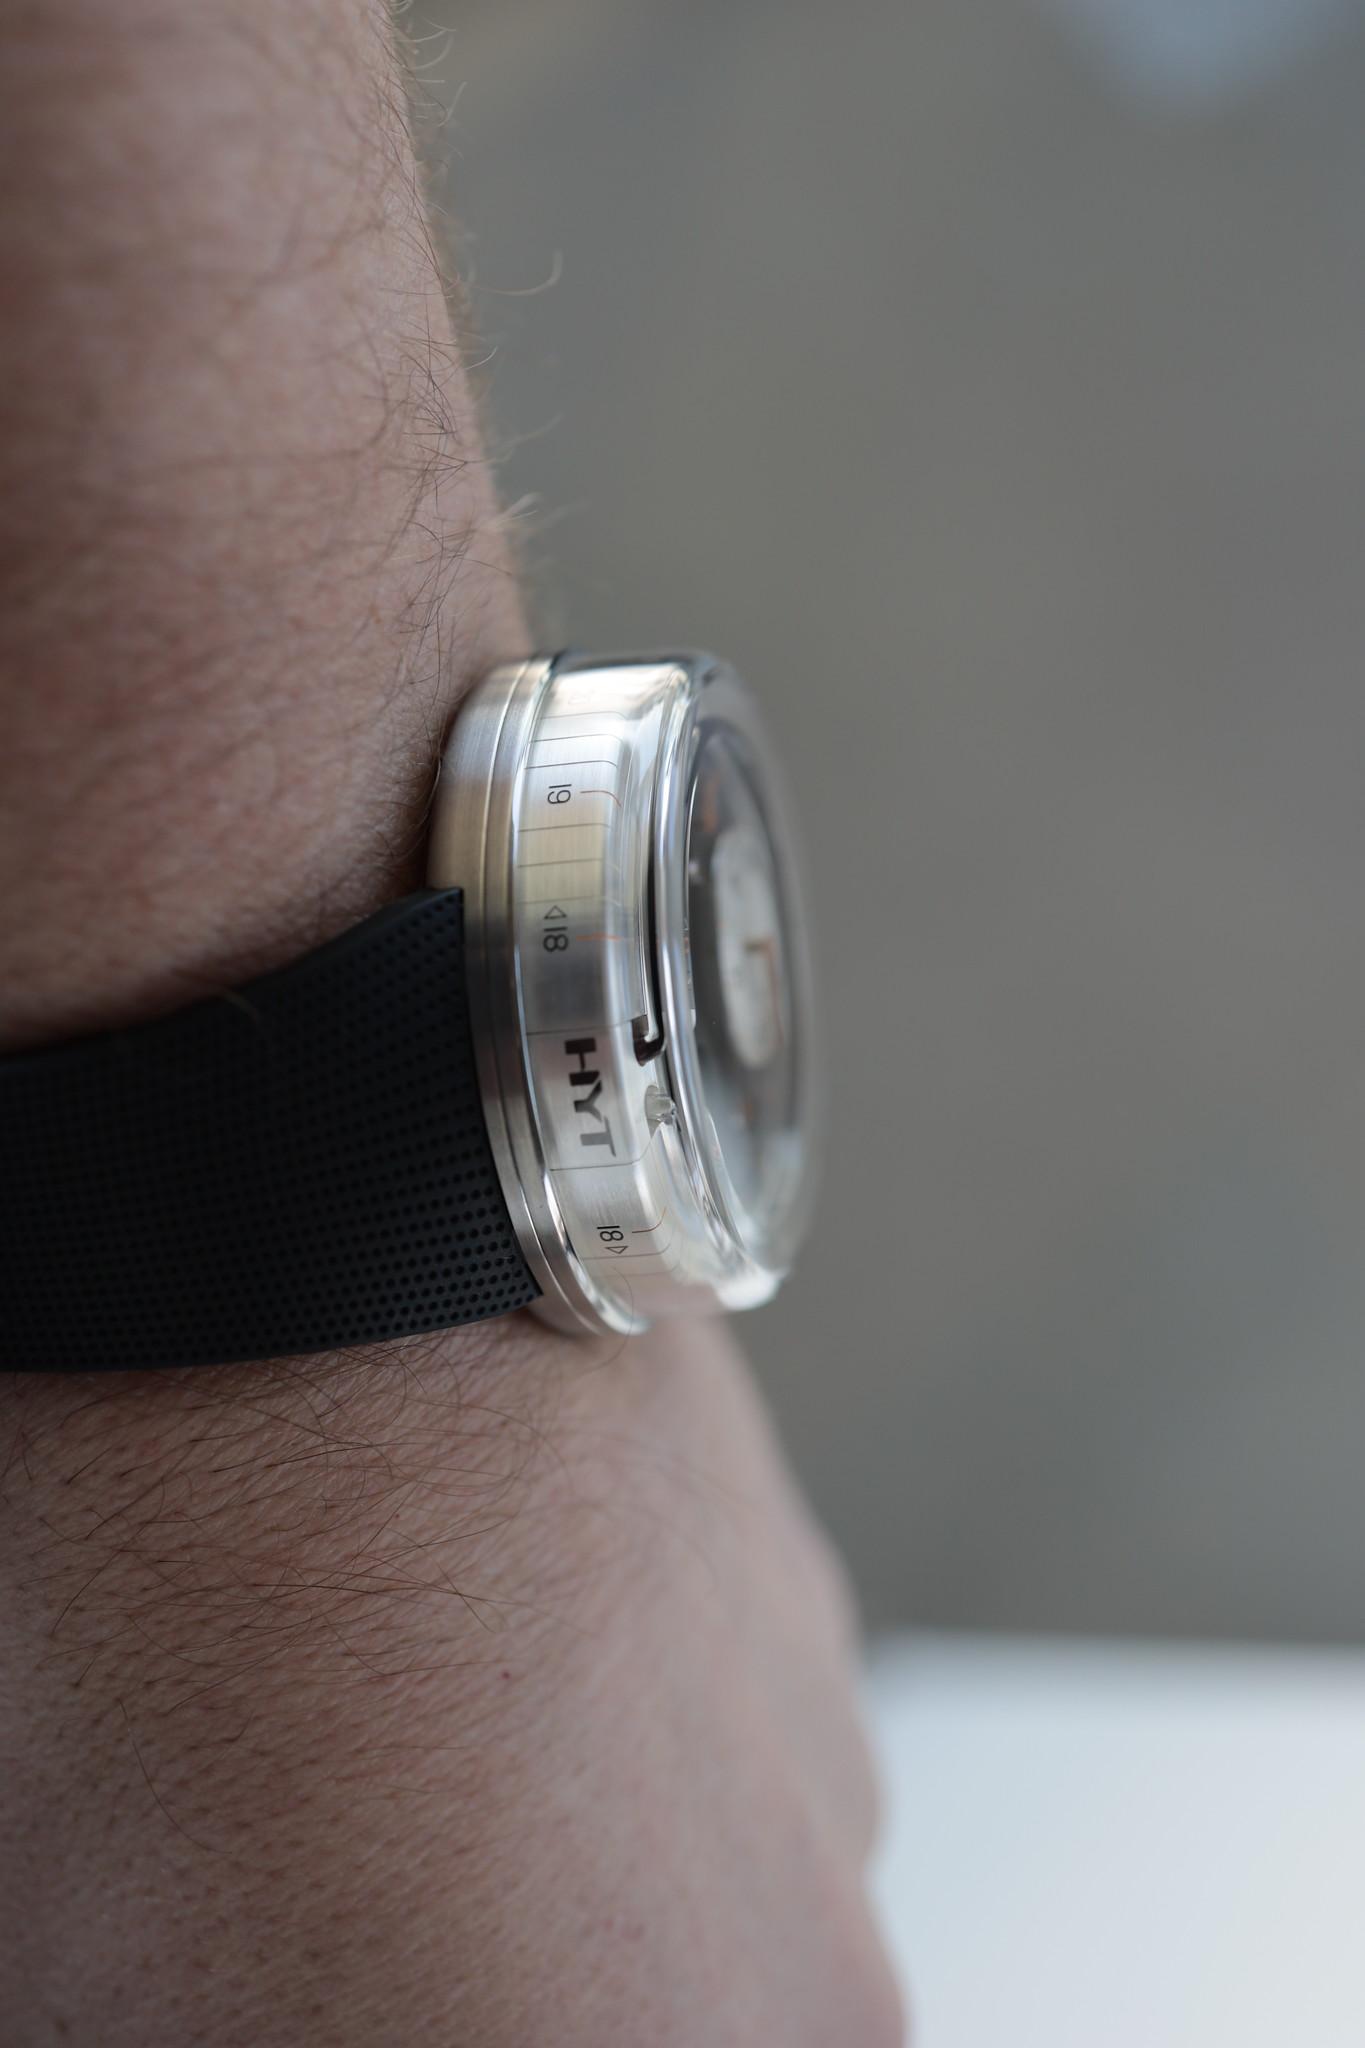 HYT H0 Orange on the wrist